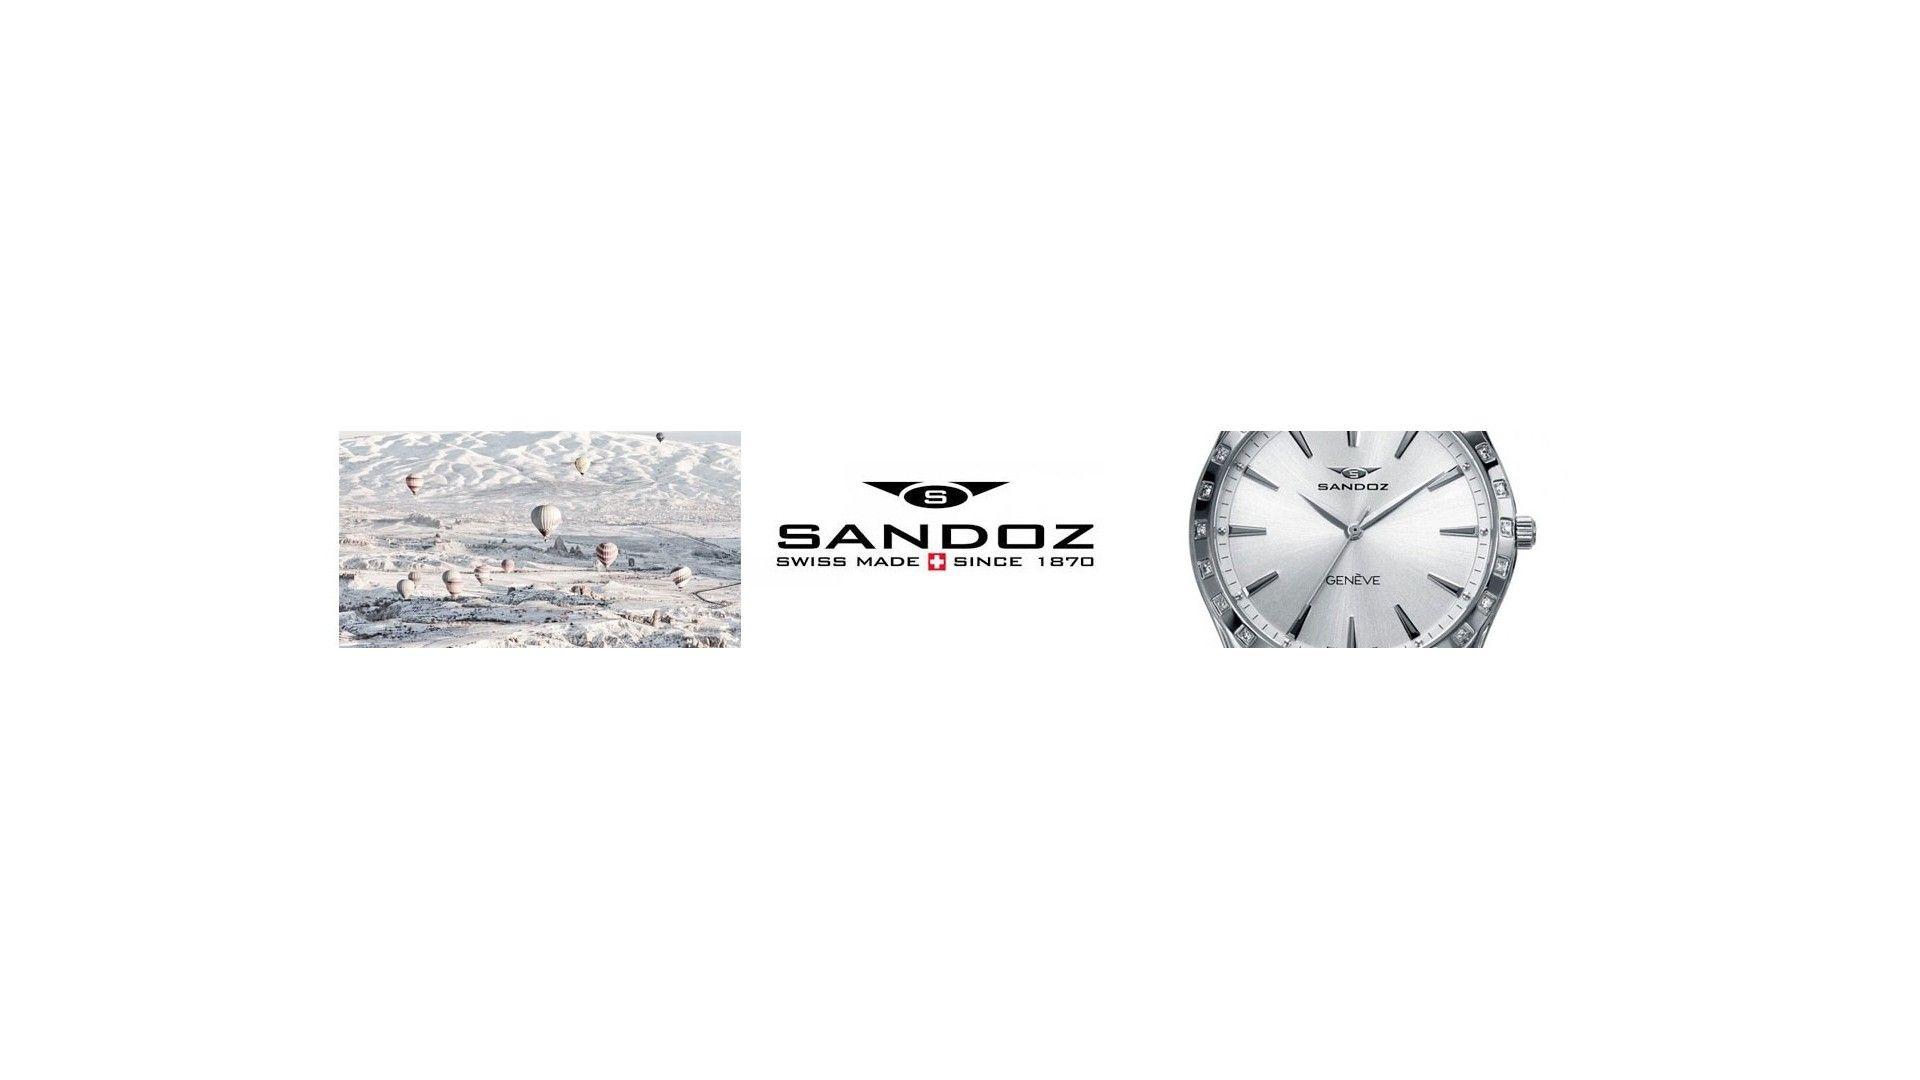 Relojes Sandoz - Comprar online